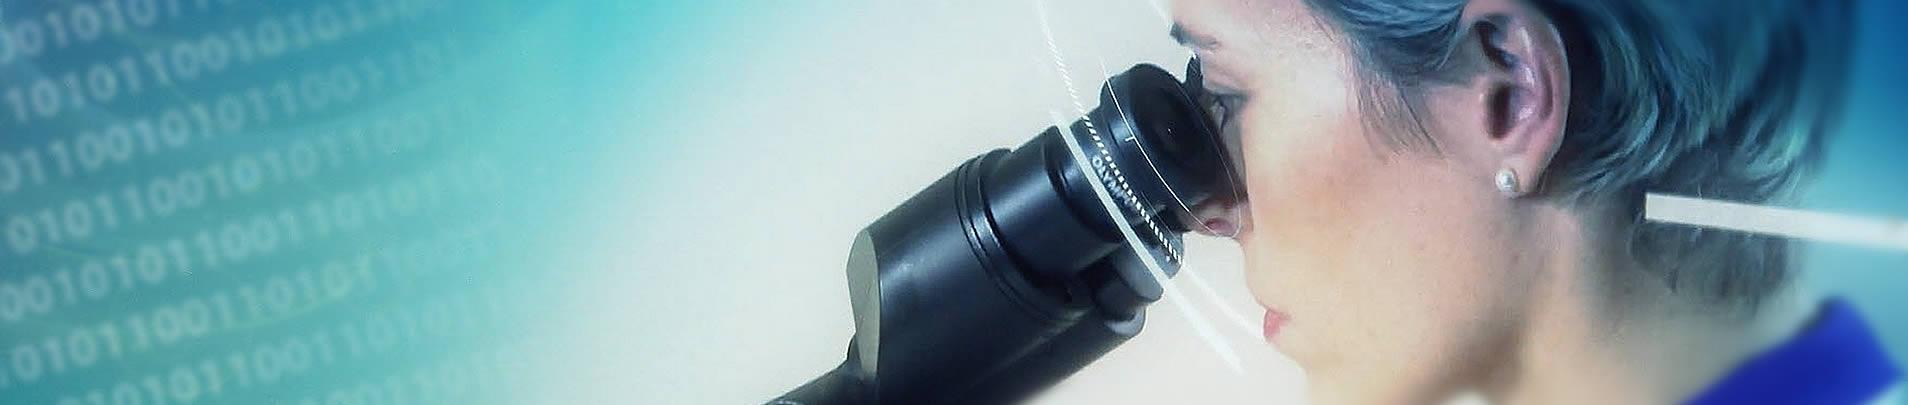 ar microscope for pathology screening